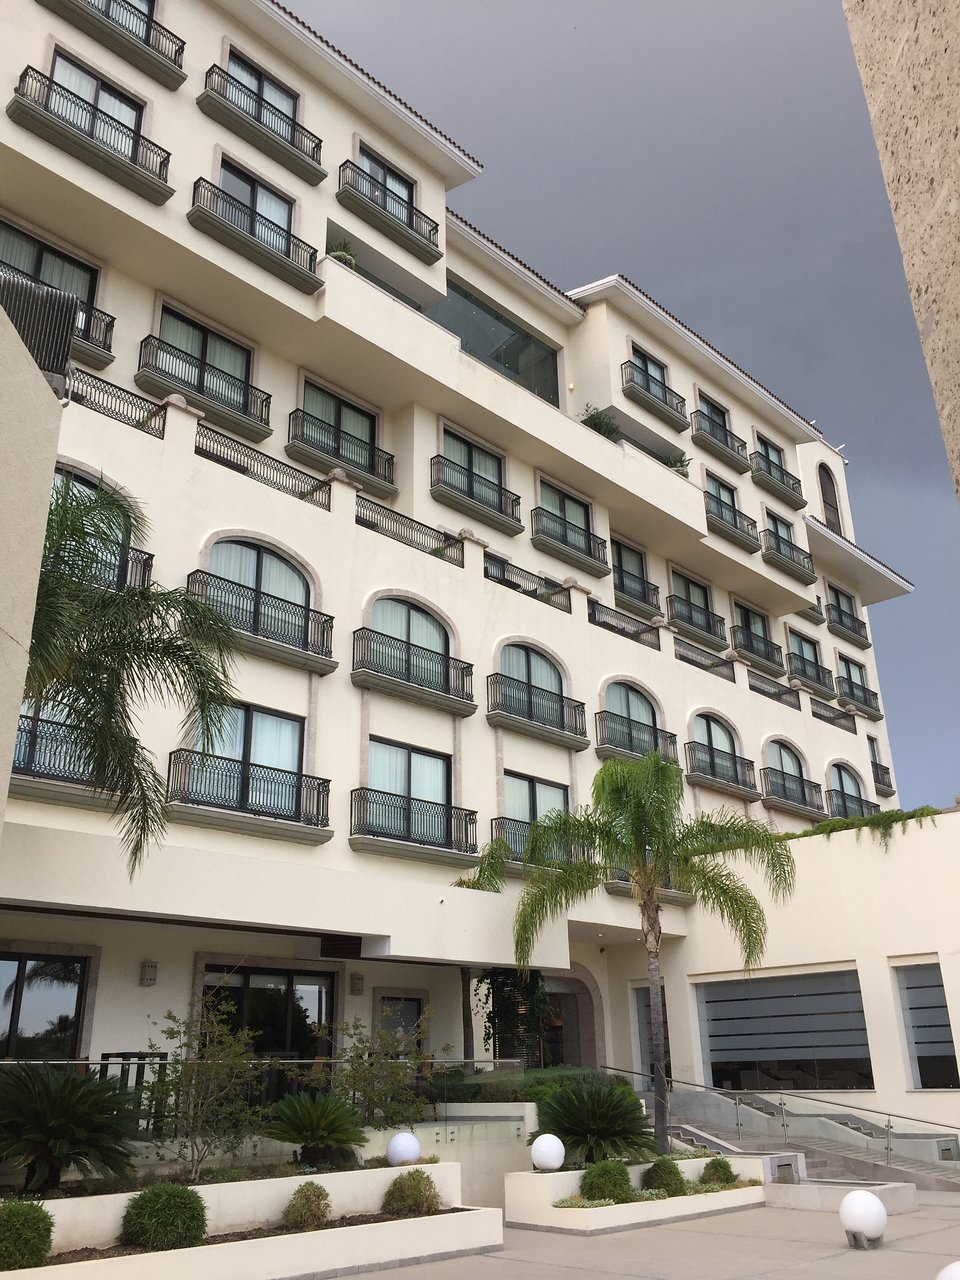 Hs Hotsson Hotel Leon 80 1 0 Updated 2018 Prices Reviews Mexico Guanajuato Tripadvisor